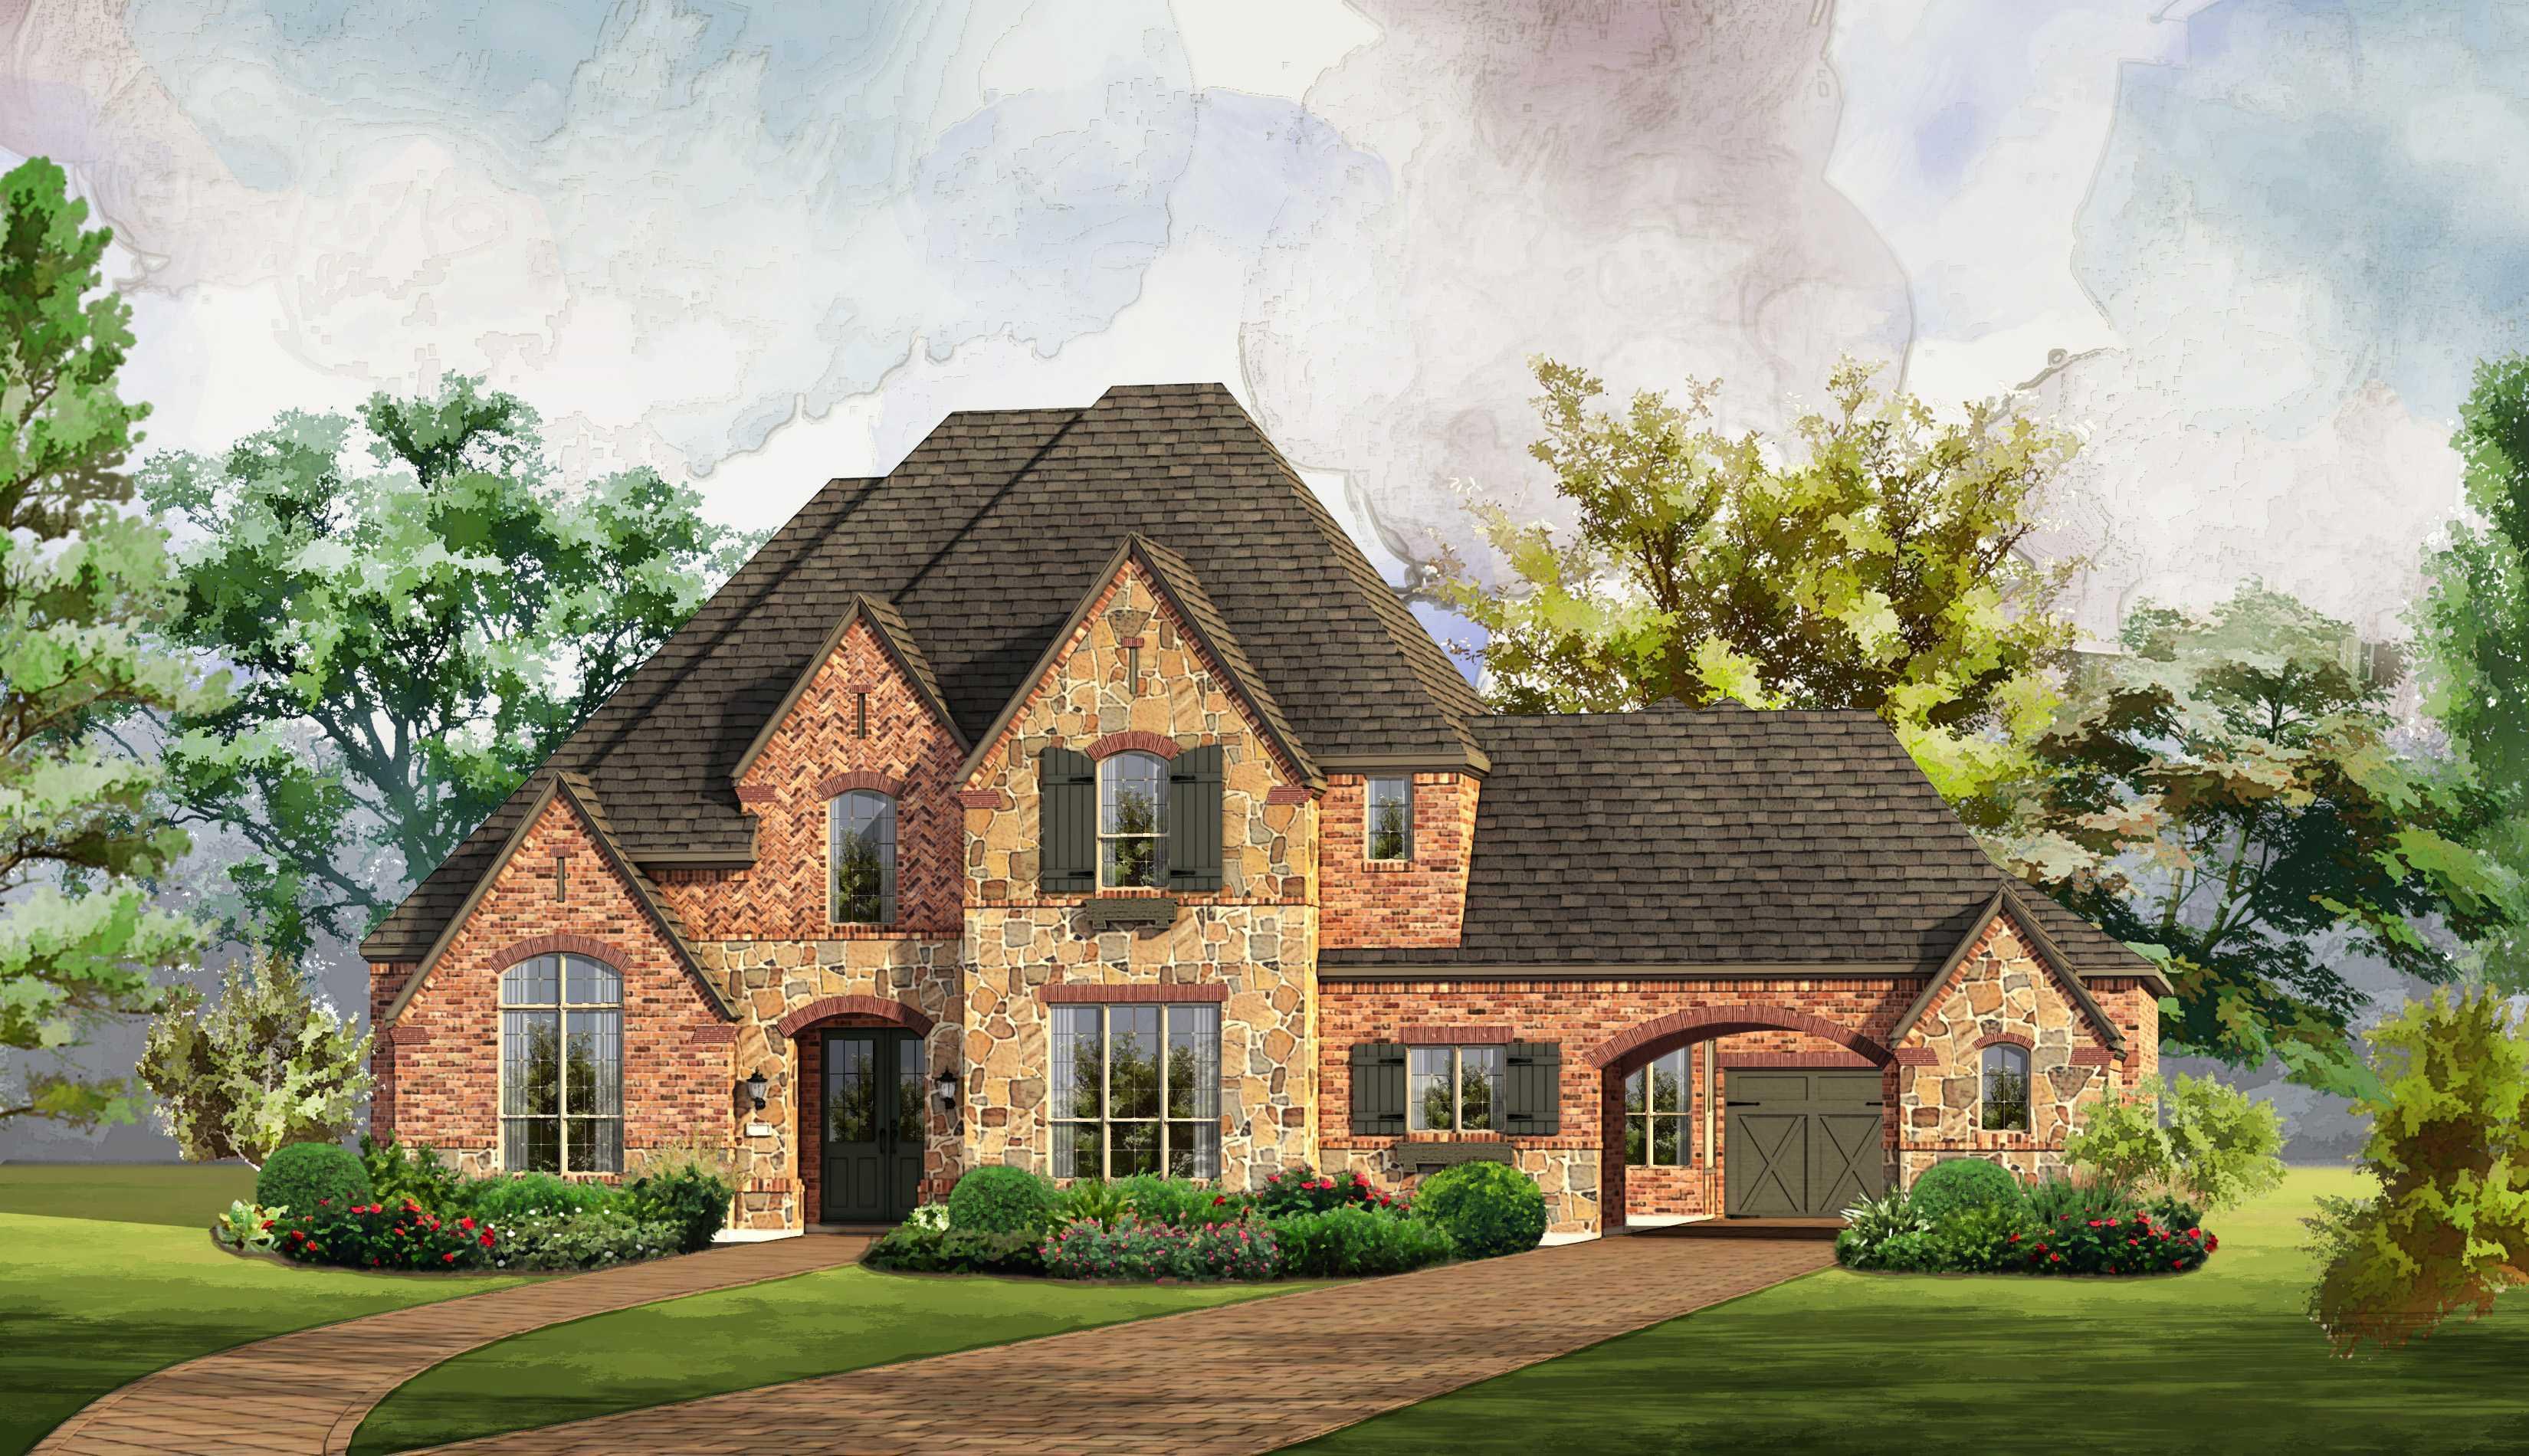 Single Family for Sale at Regency Park - Plan 6791 4012 Baldomera Street Flower Mound, Texas 75022 United States